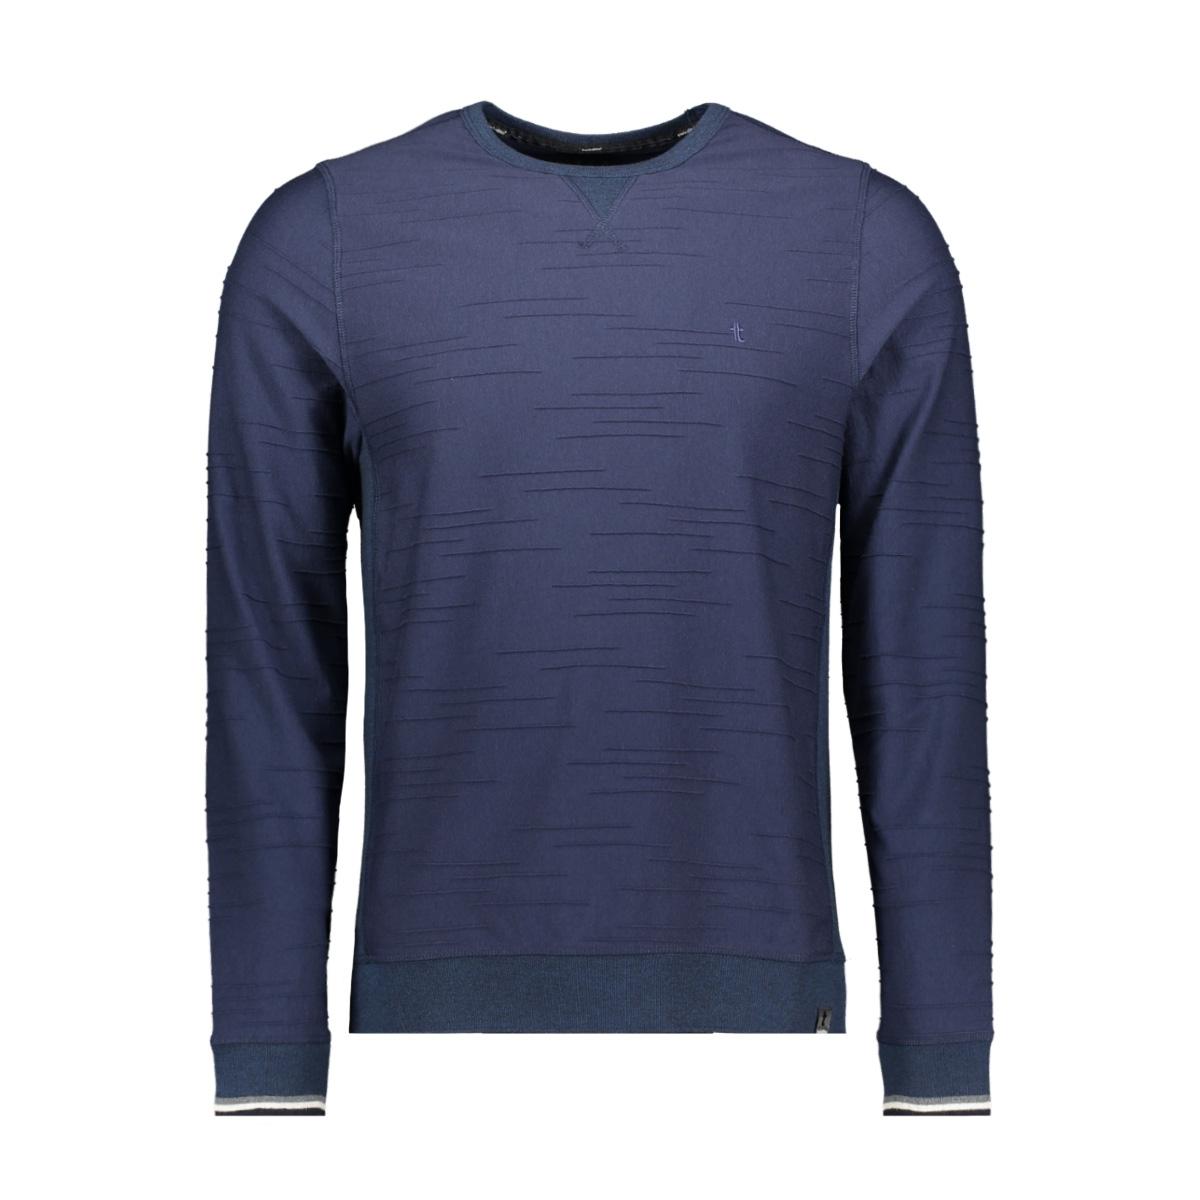 1901 5510 m 1 twinlife t-shirt 6990 nightblue